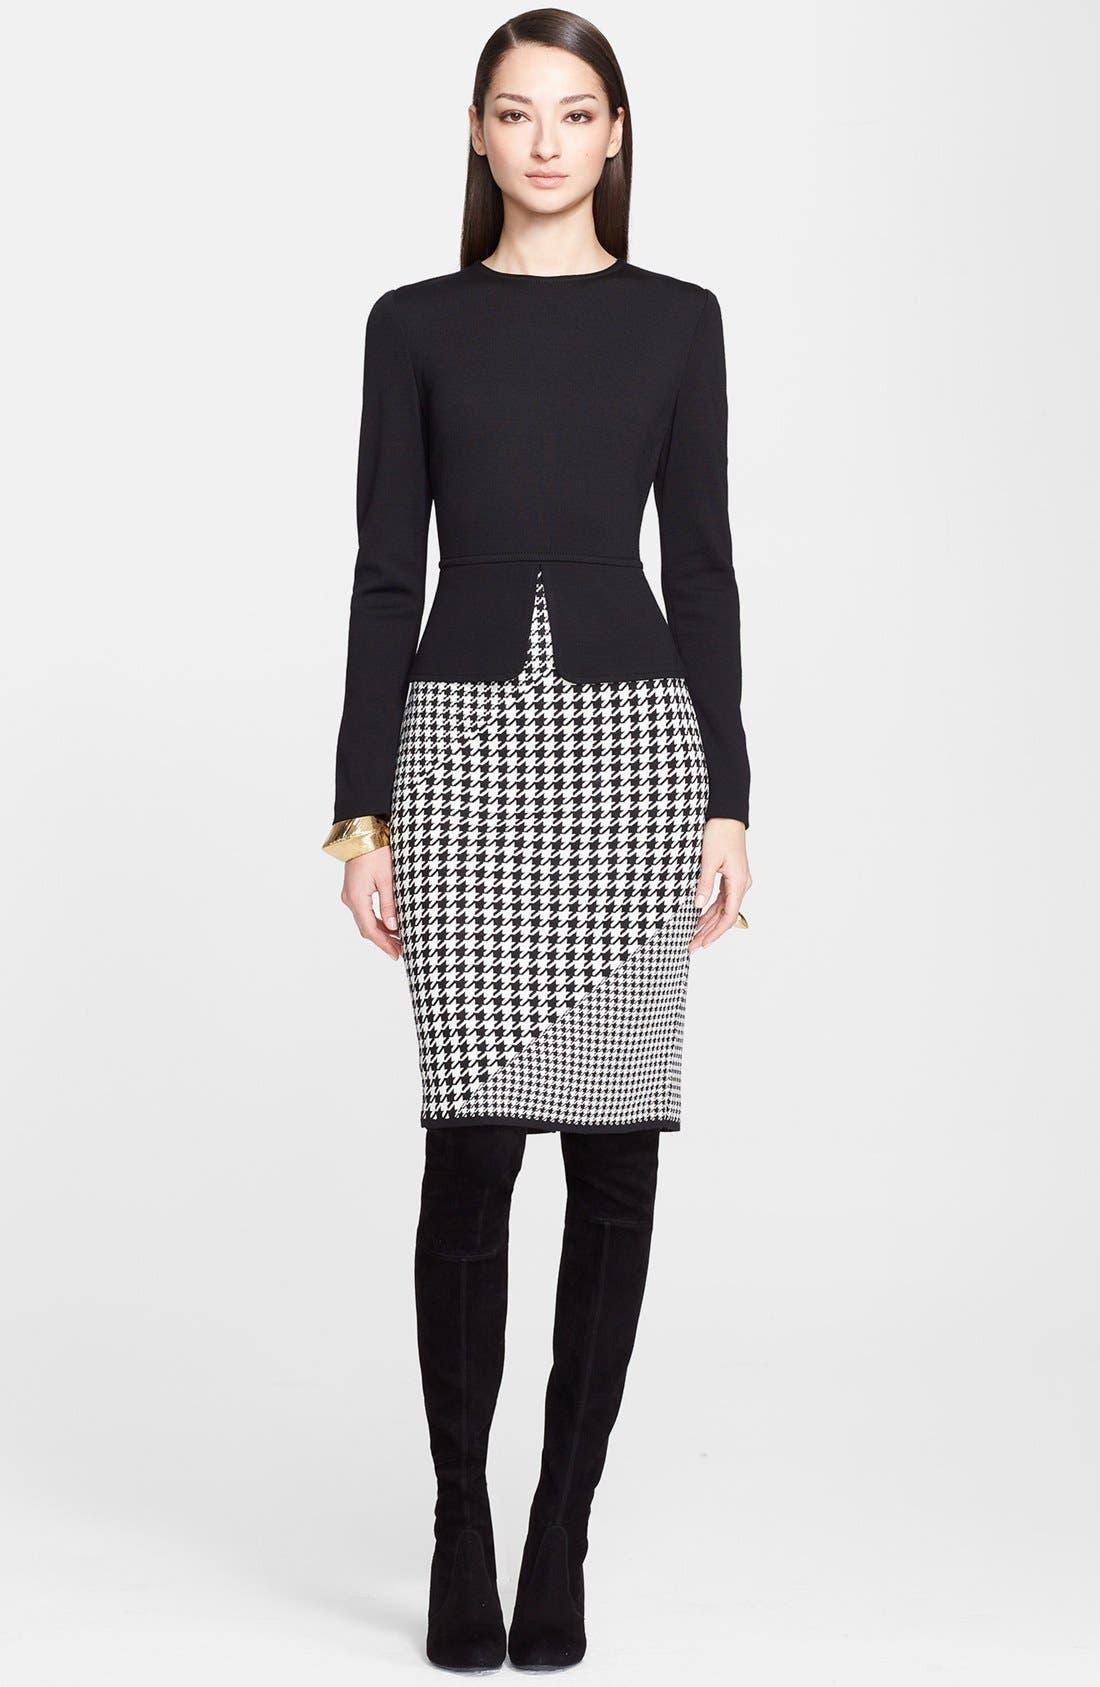 Main Image - St. John Collection Milano Knit Peplum Dress